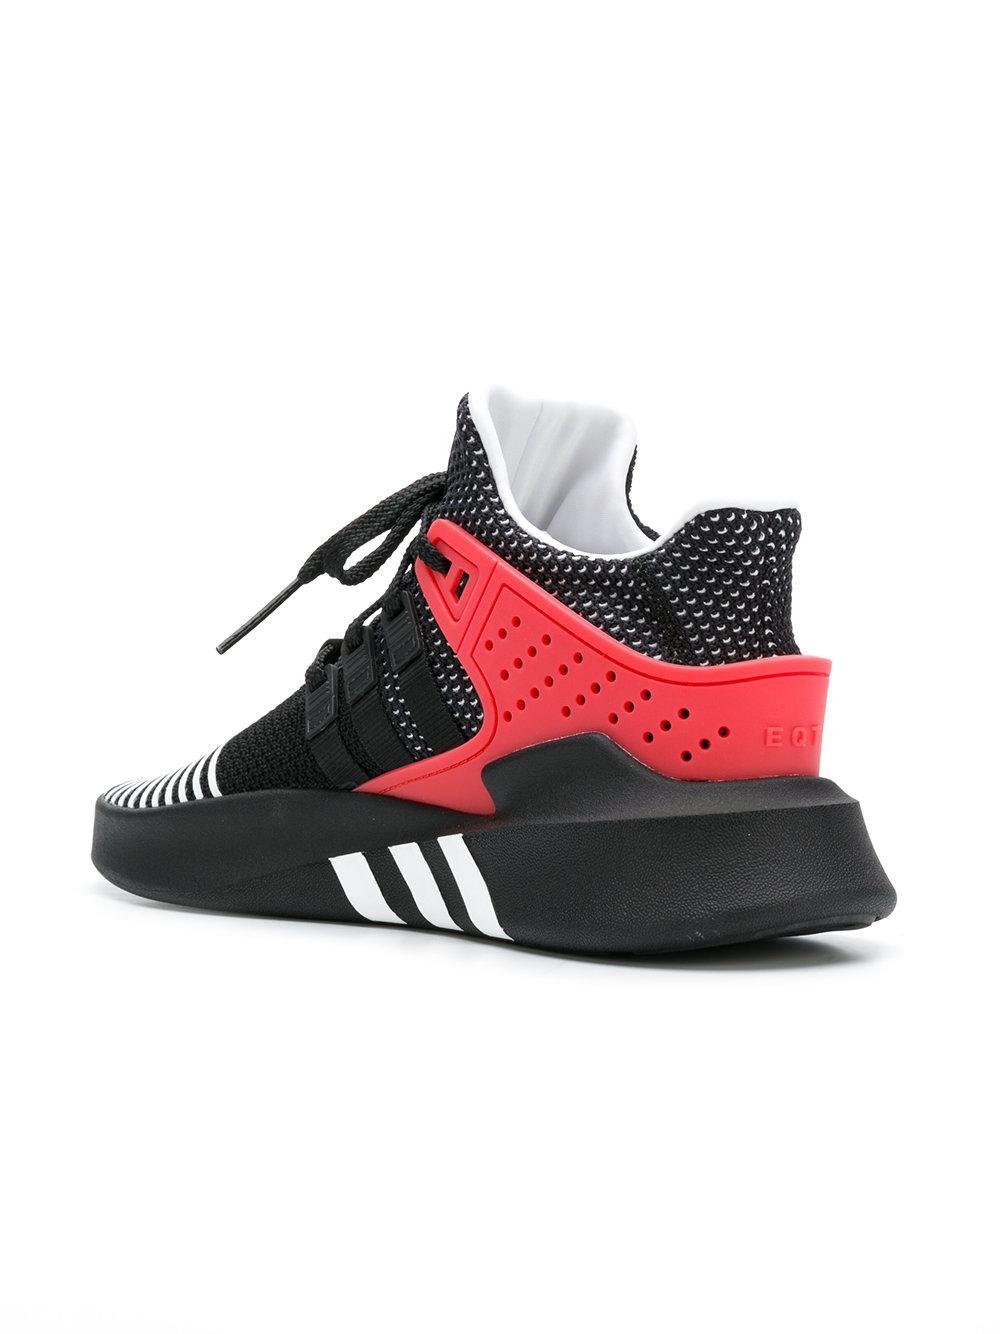 b5acfa18db6 Adidas - Black Eqt Bask Adv Sneakers for Men - Lyst. View fullscreen